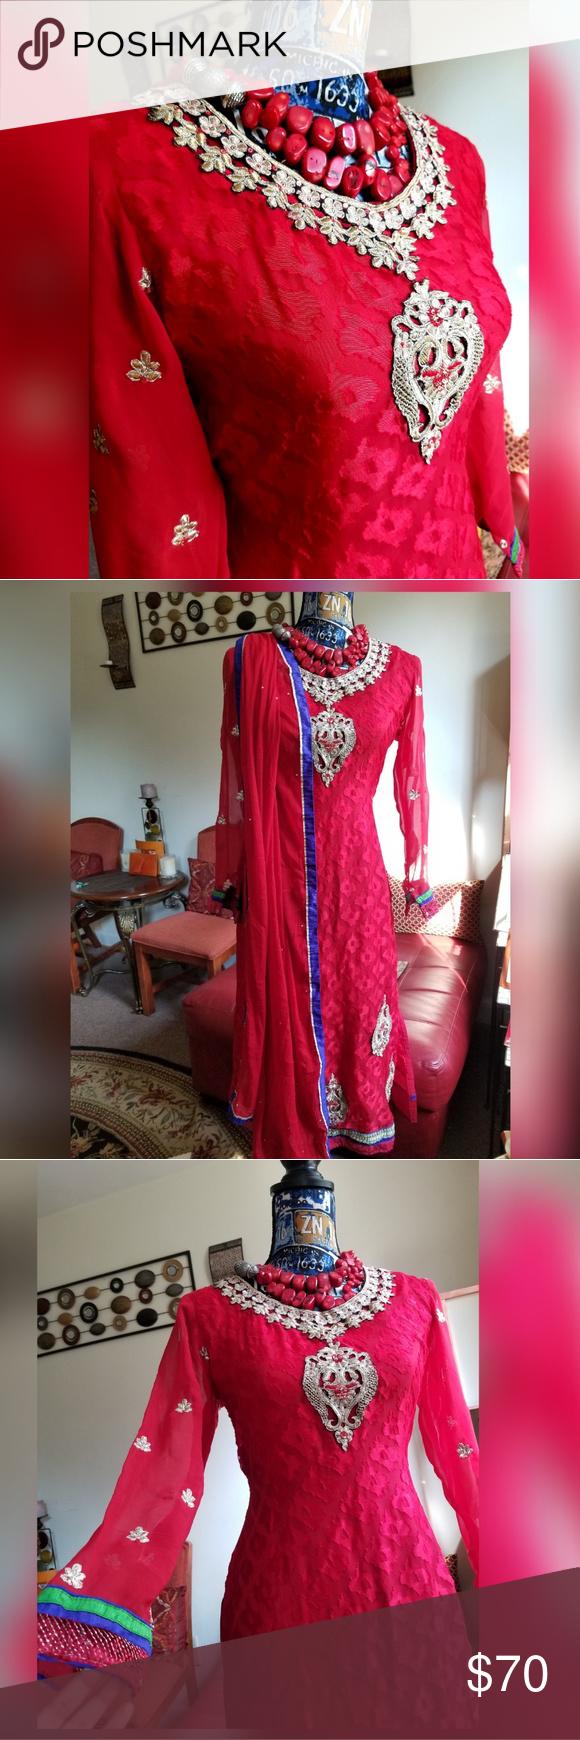 Designers kameez pakistani indian bangladeshi suit my posh picks